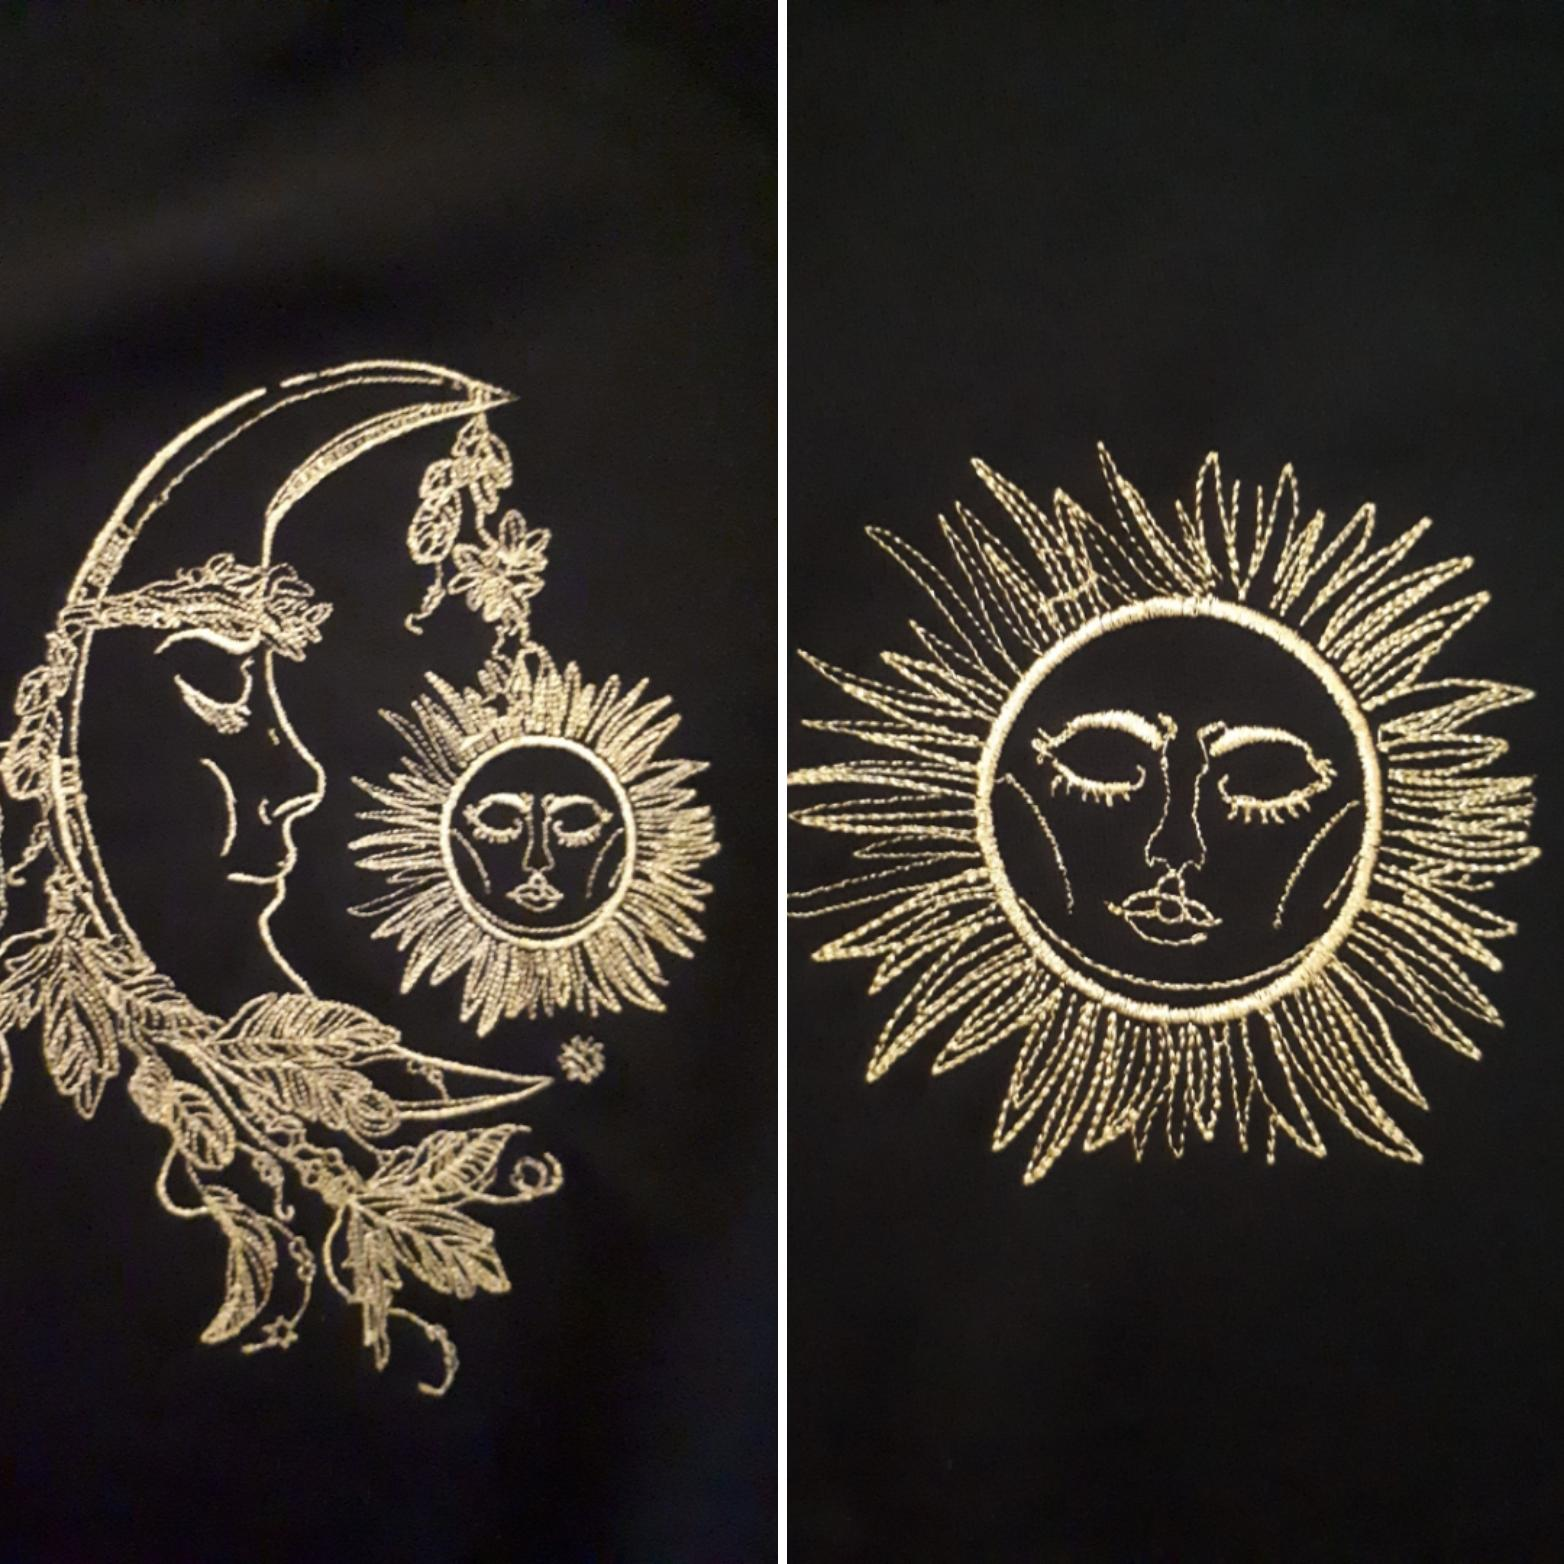 Sleeping moon and sun design